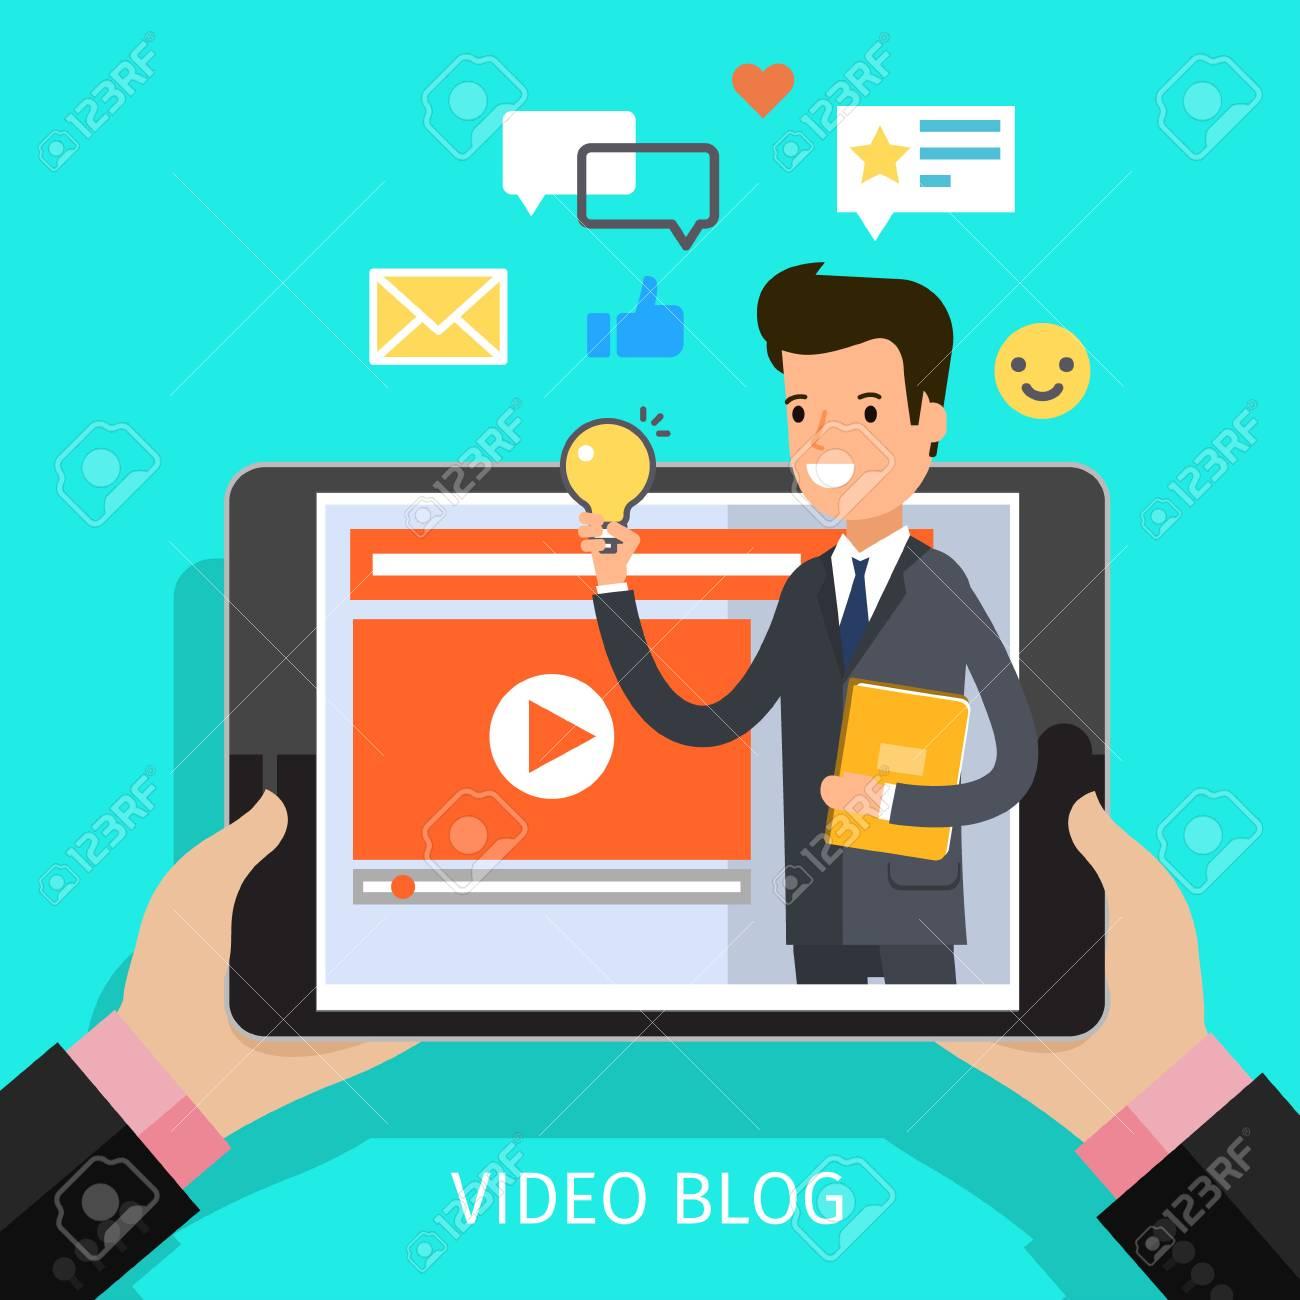 Concept of video blogging. - 76259826